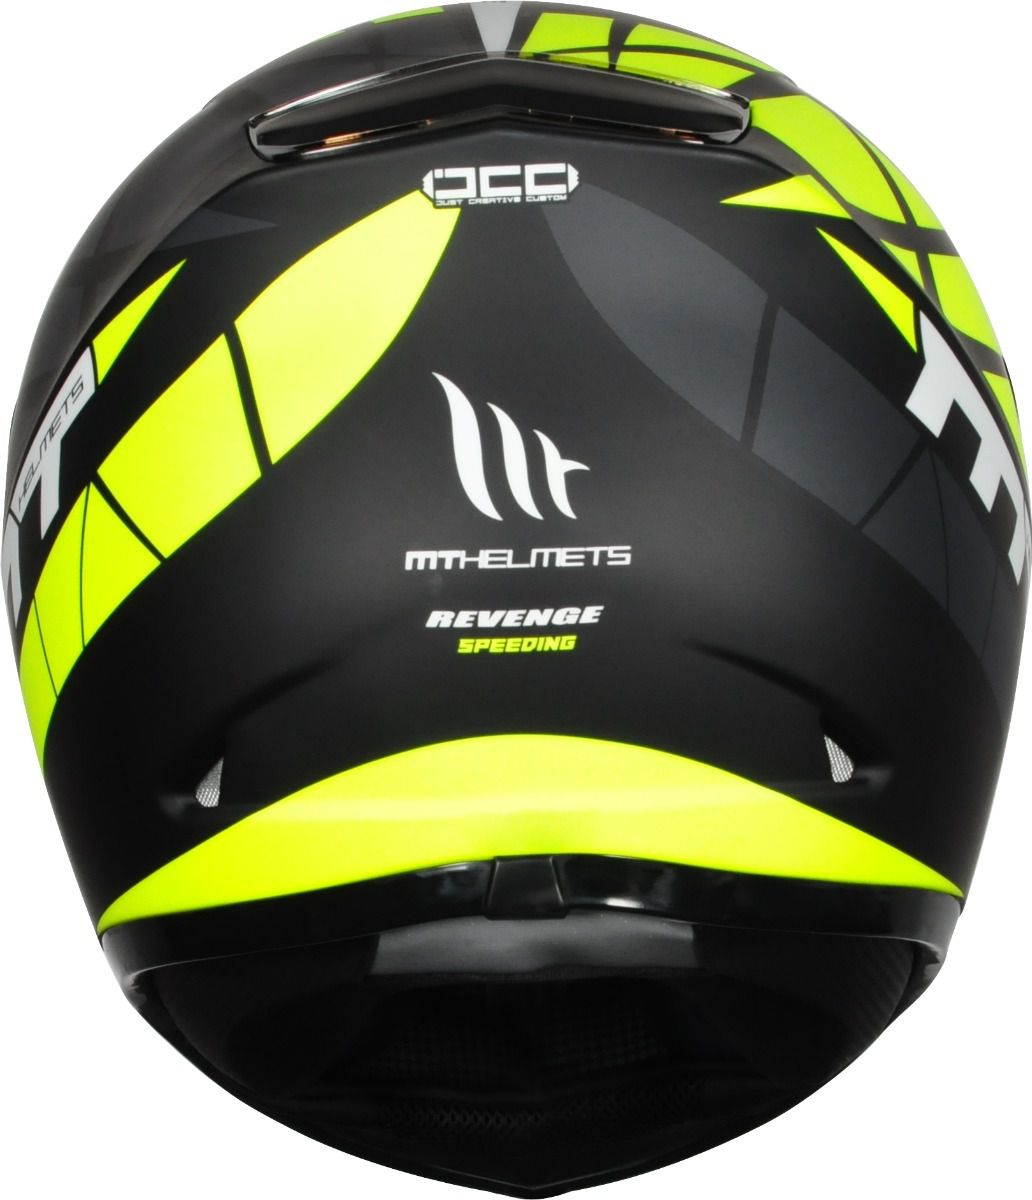 Capacete Revenge Speeding Preto e Amarelo Fosco MT  - Motorshopp